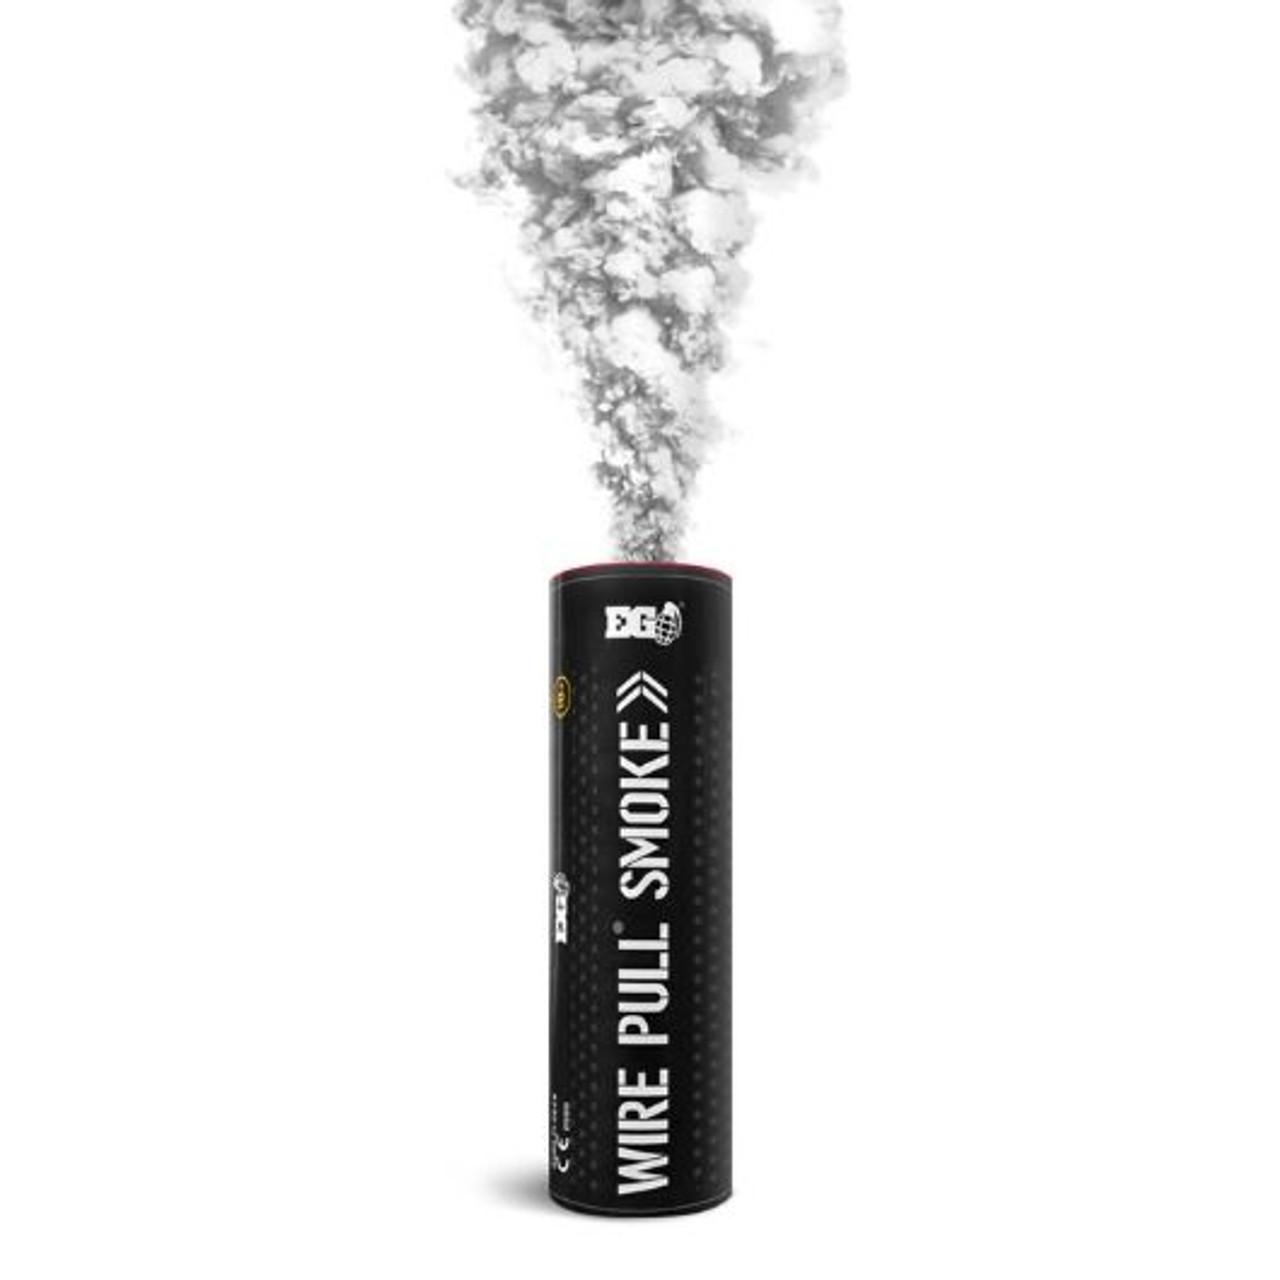 Pyro Shipped Easy Wire Pull Smoke Grenade white